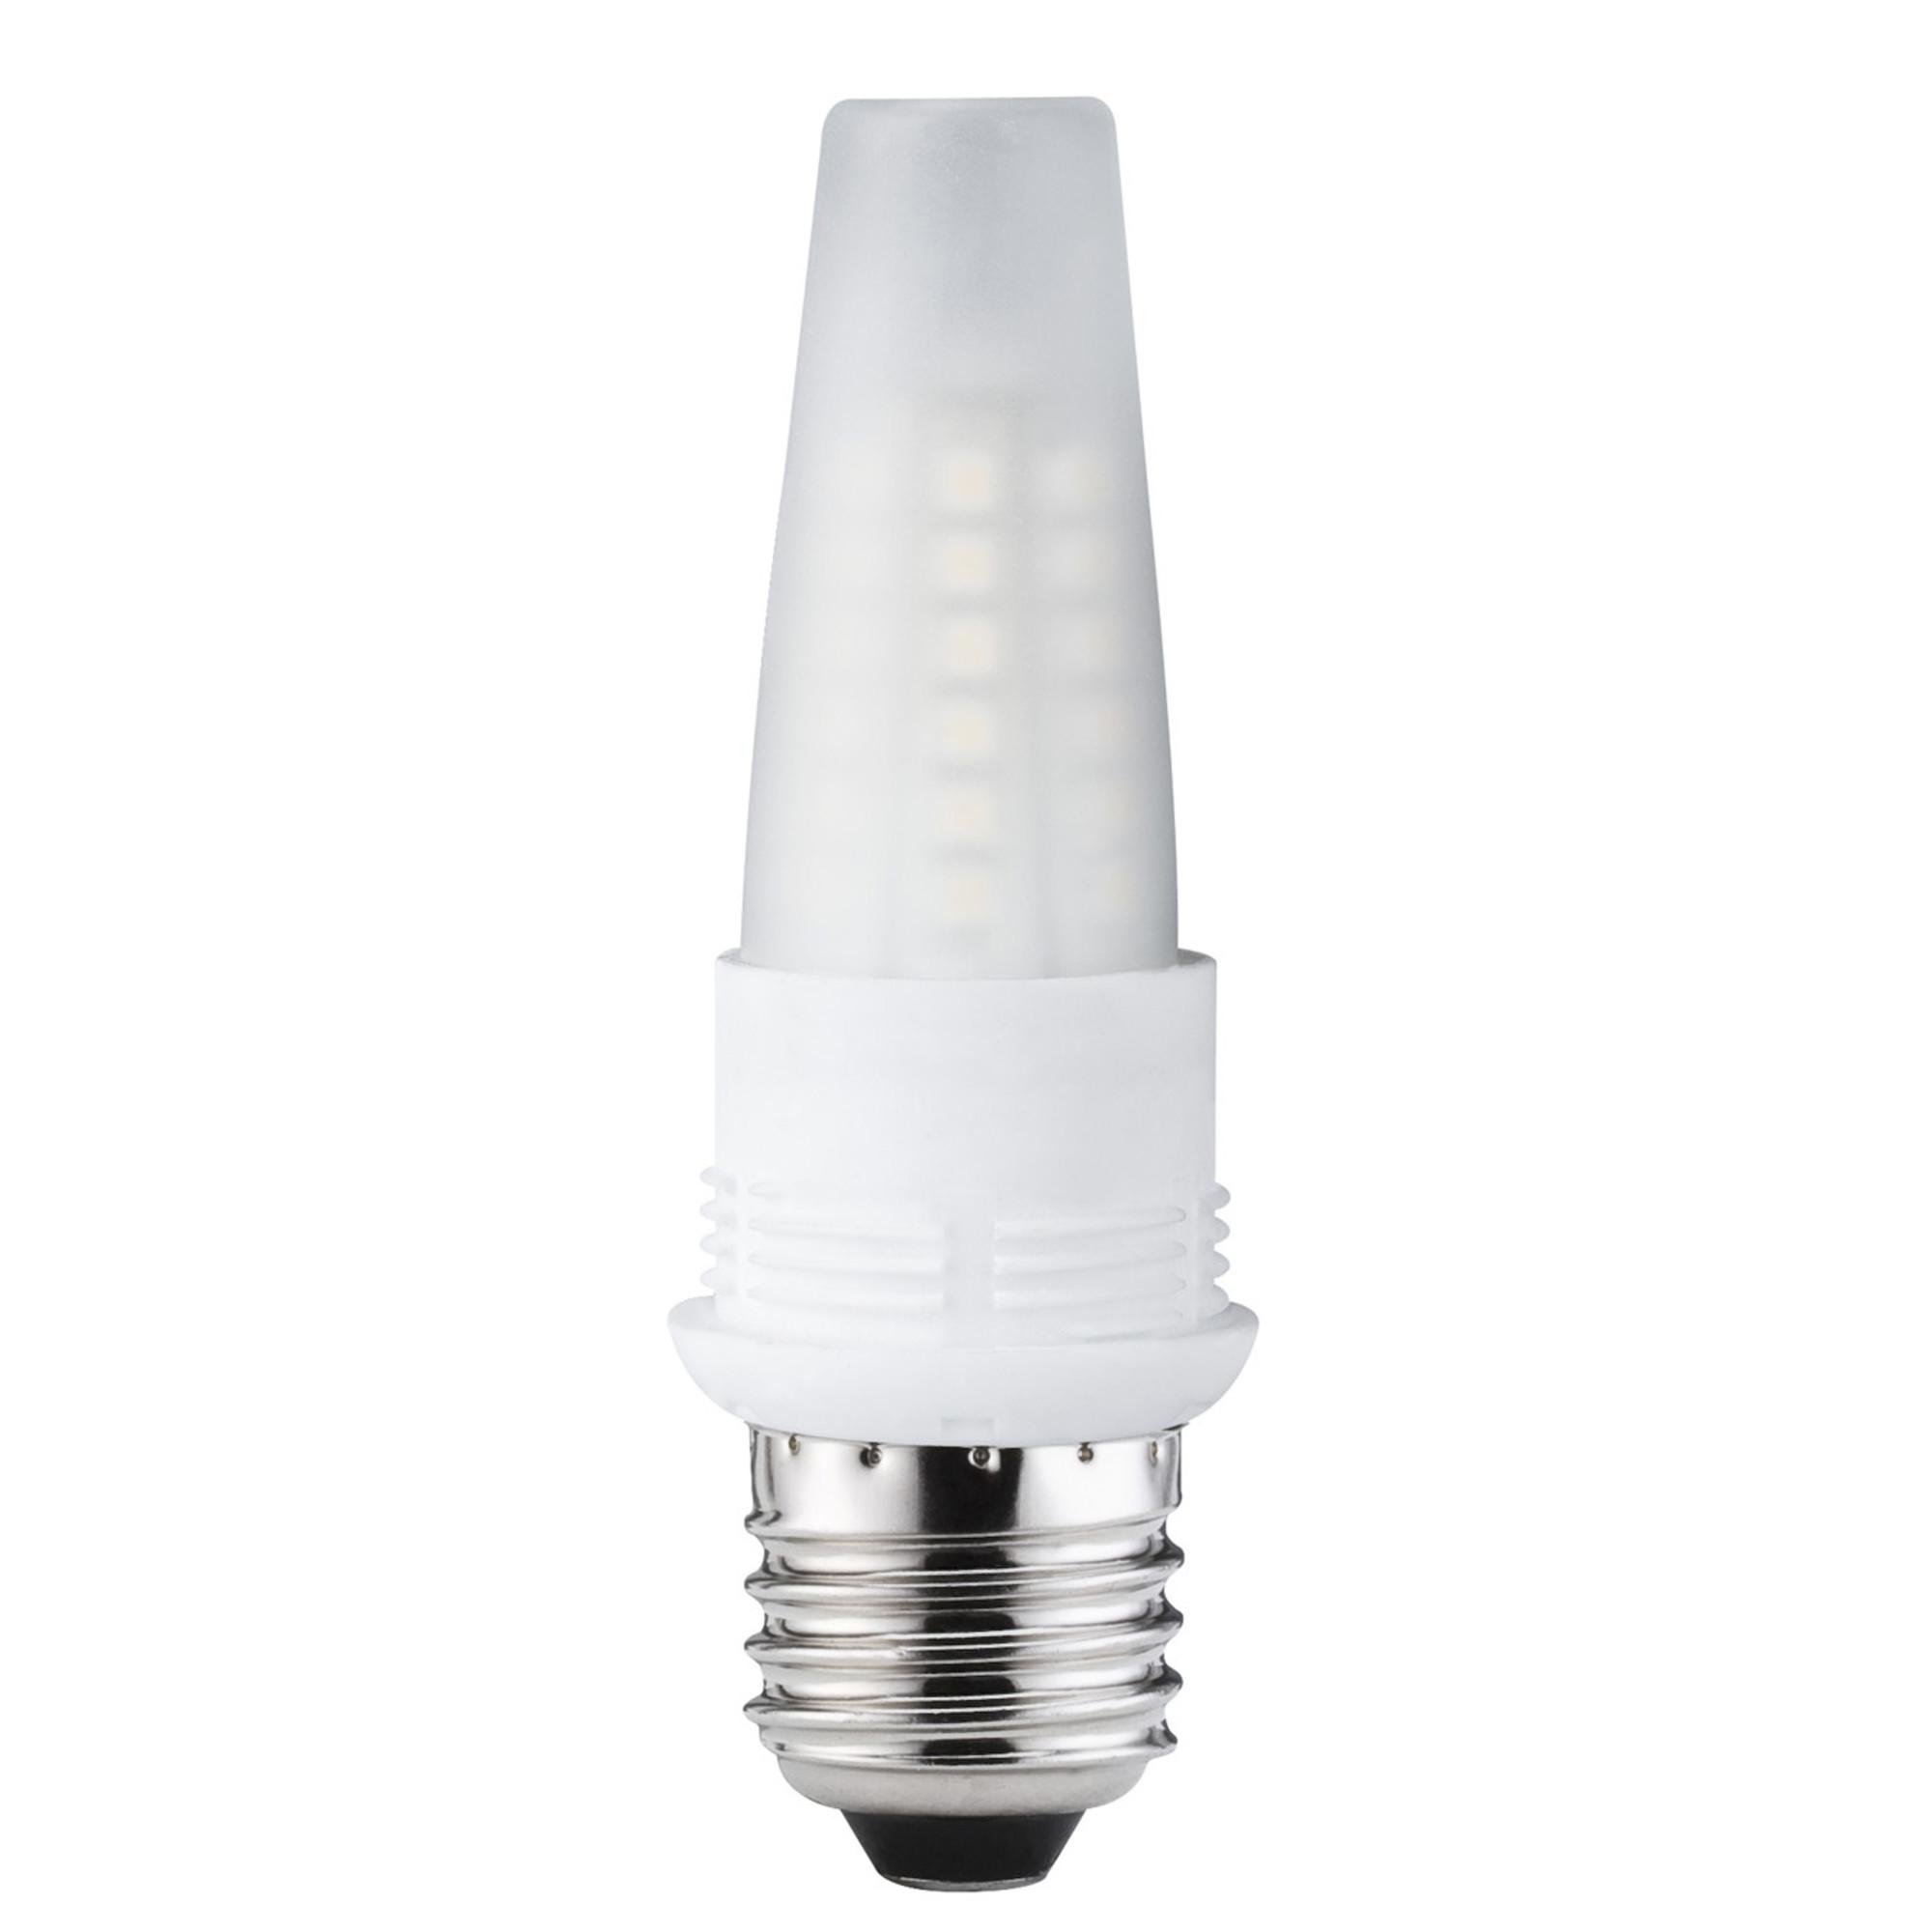 Лампа светодиодная Paulmann 28120 E27 128 Лм теплый свет